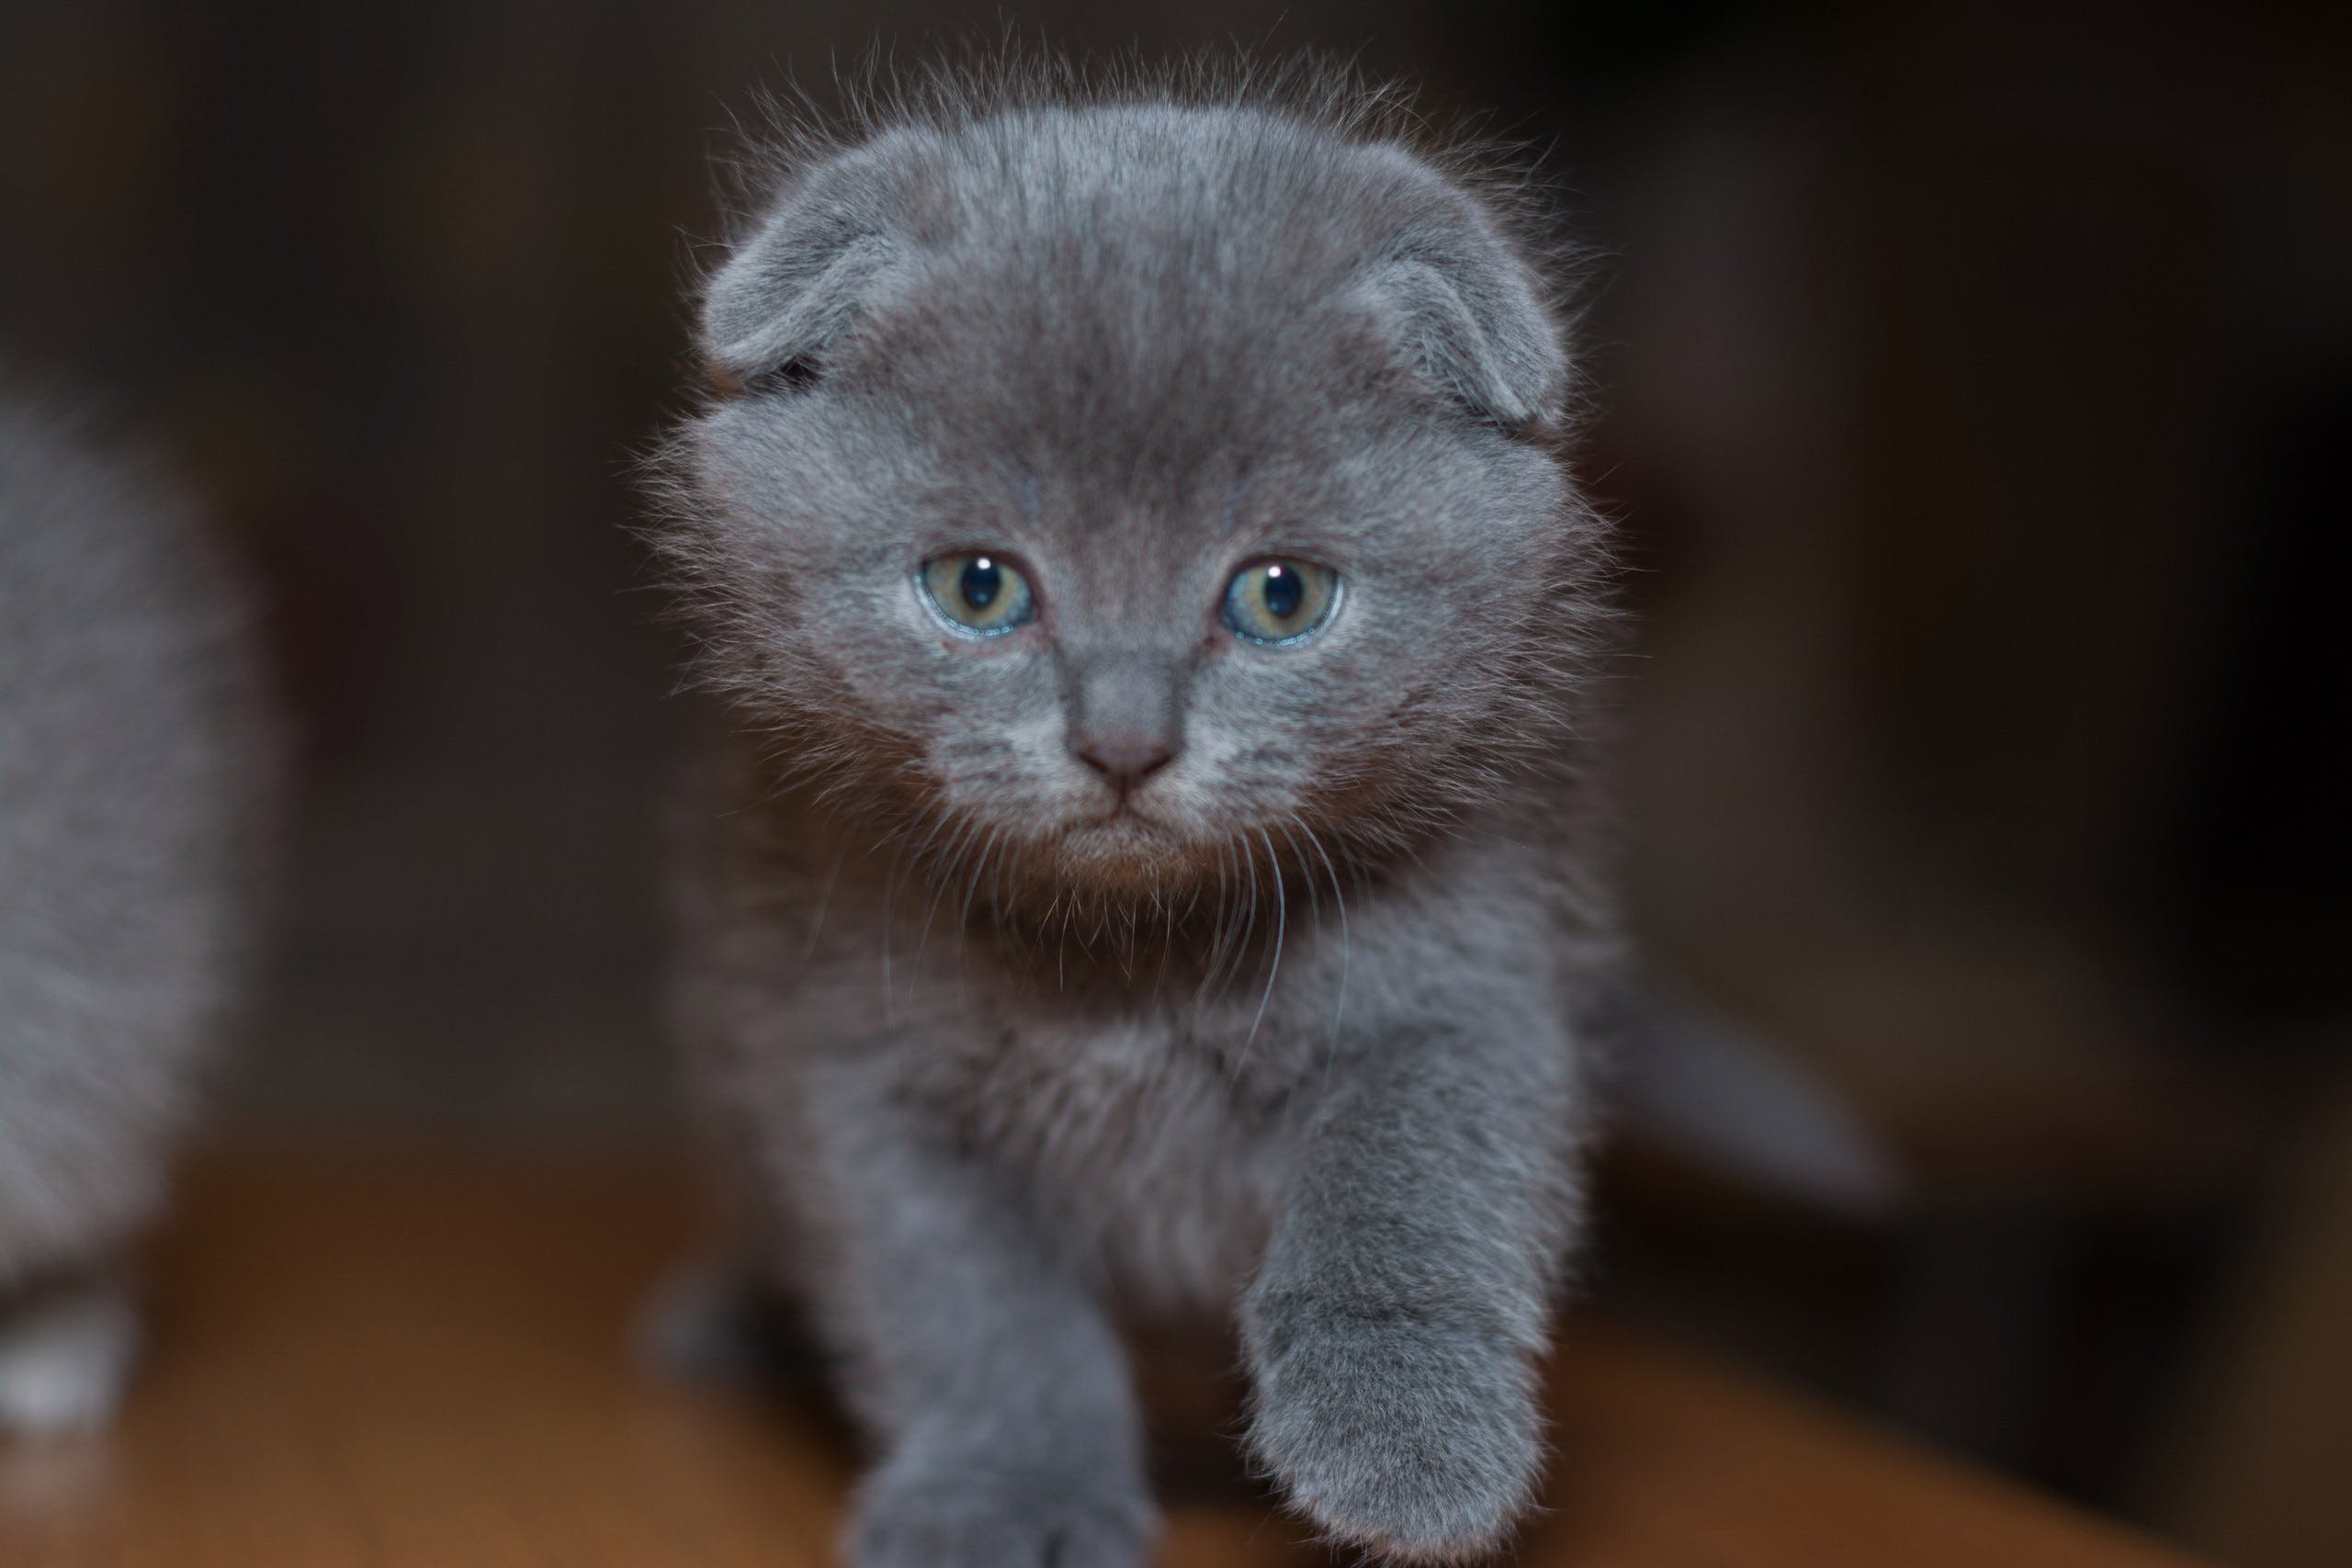 animal, cat, gray